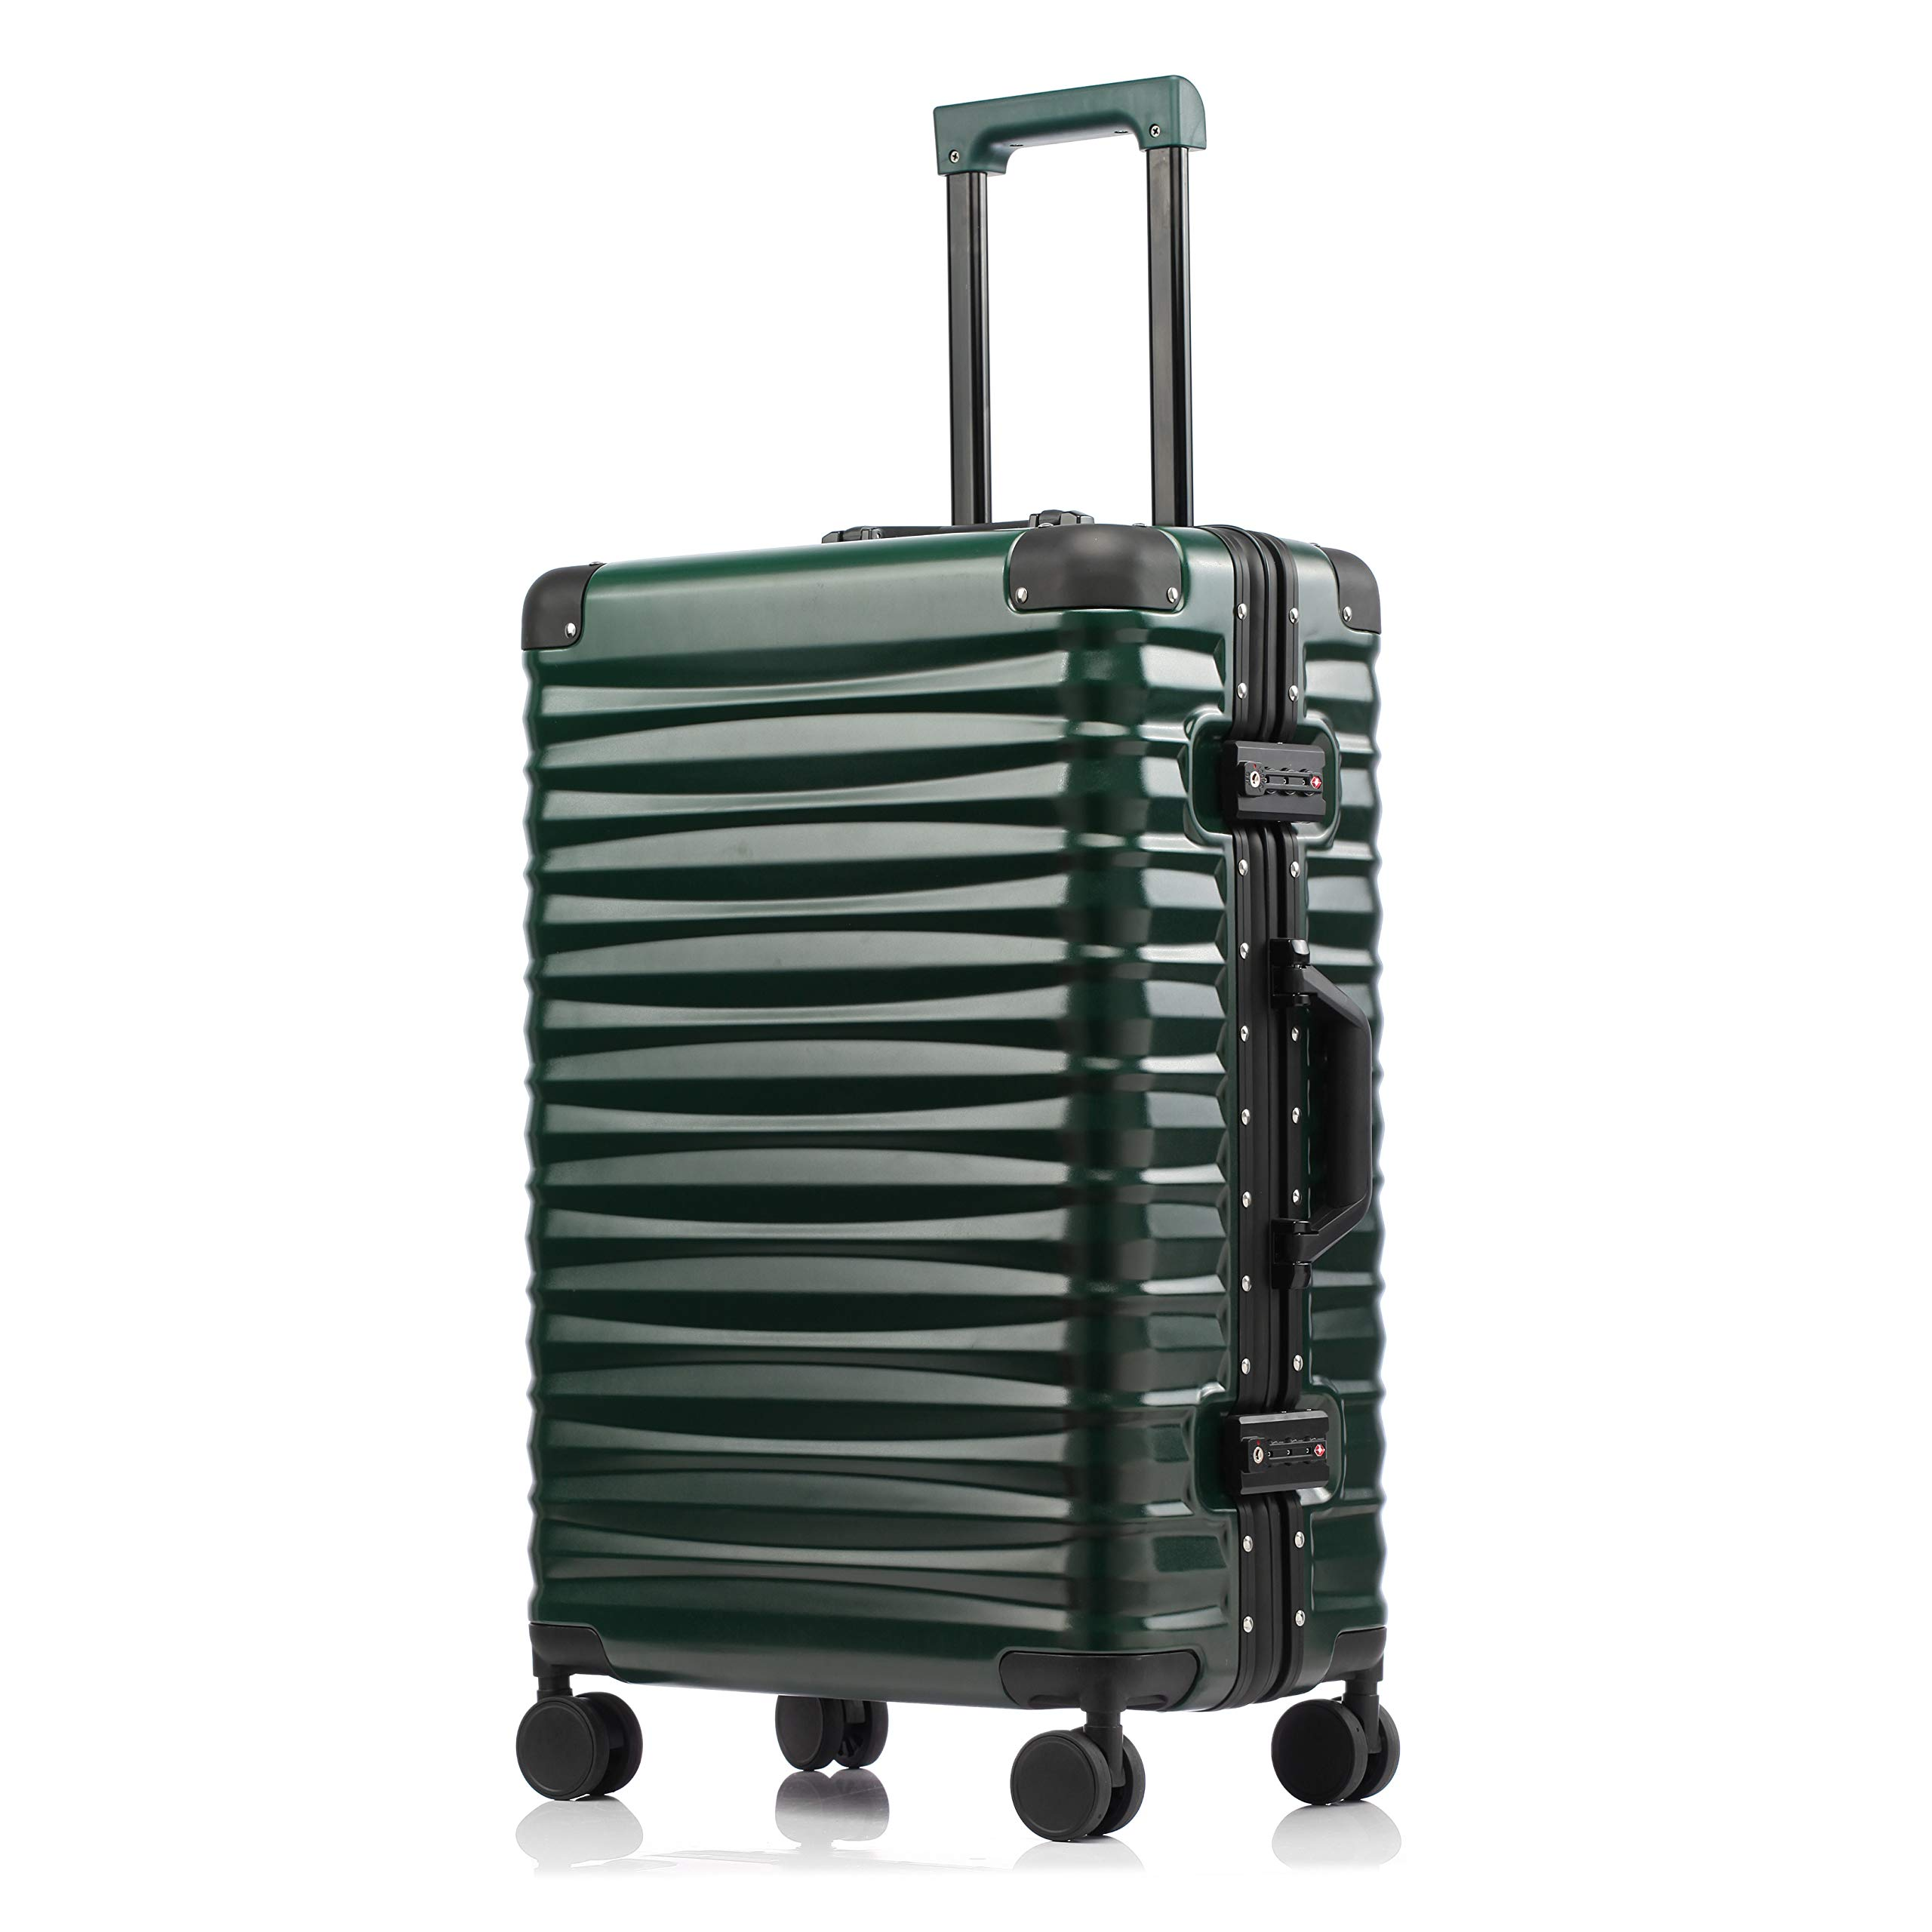 Luggage Aluminum Frame Carry On Hardside Spinner Suitcase TSA Lock 20 Inch Dark Green